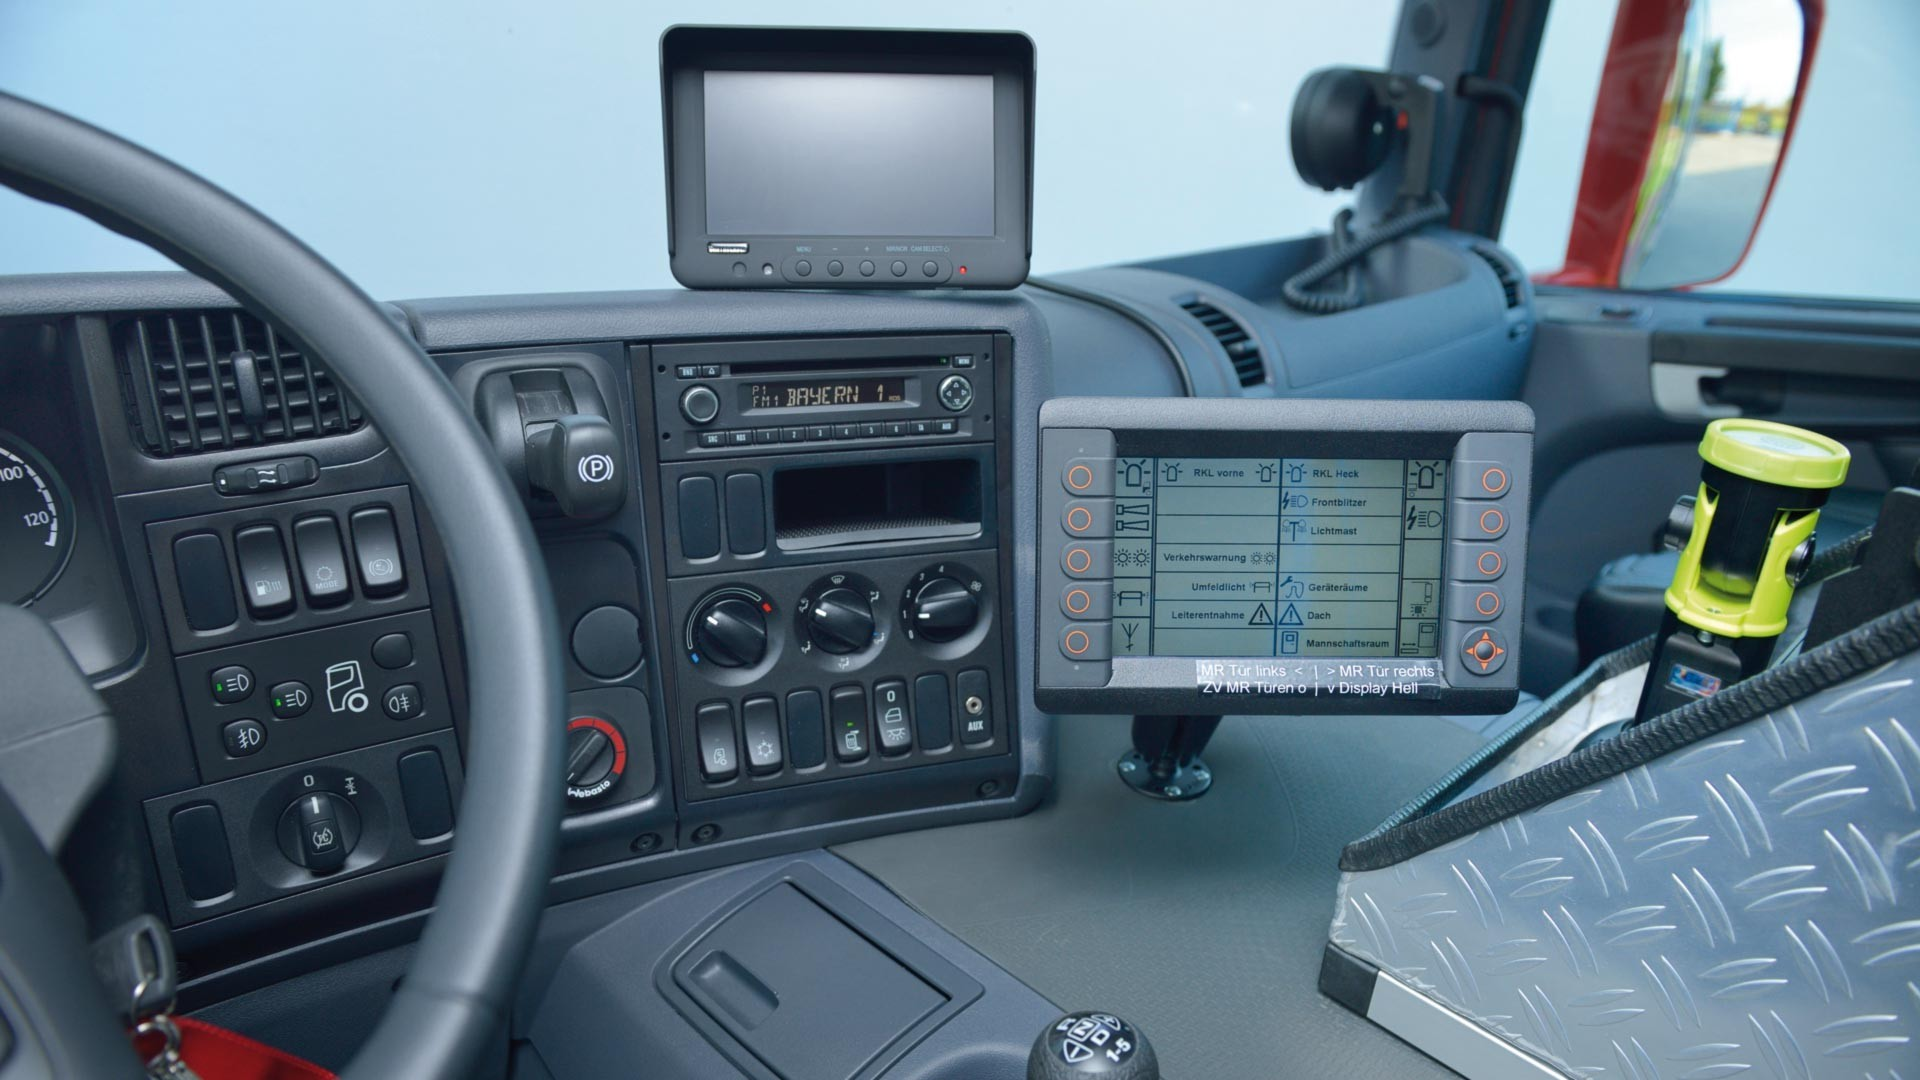 Lentner_Fahrerraum-Display_01.jpg